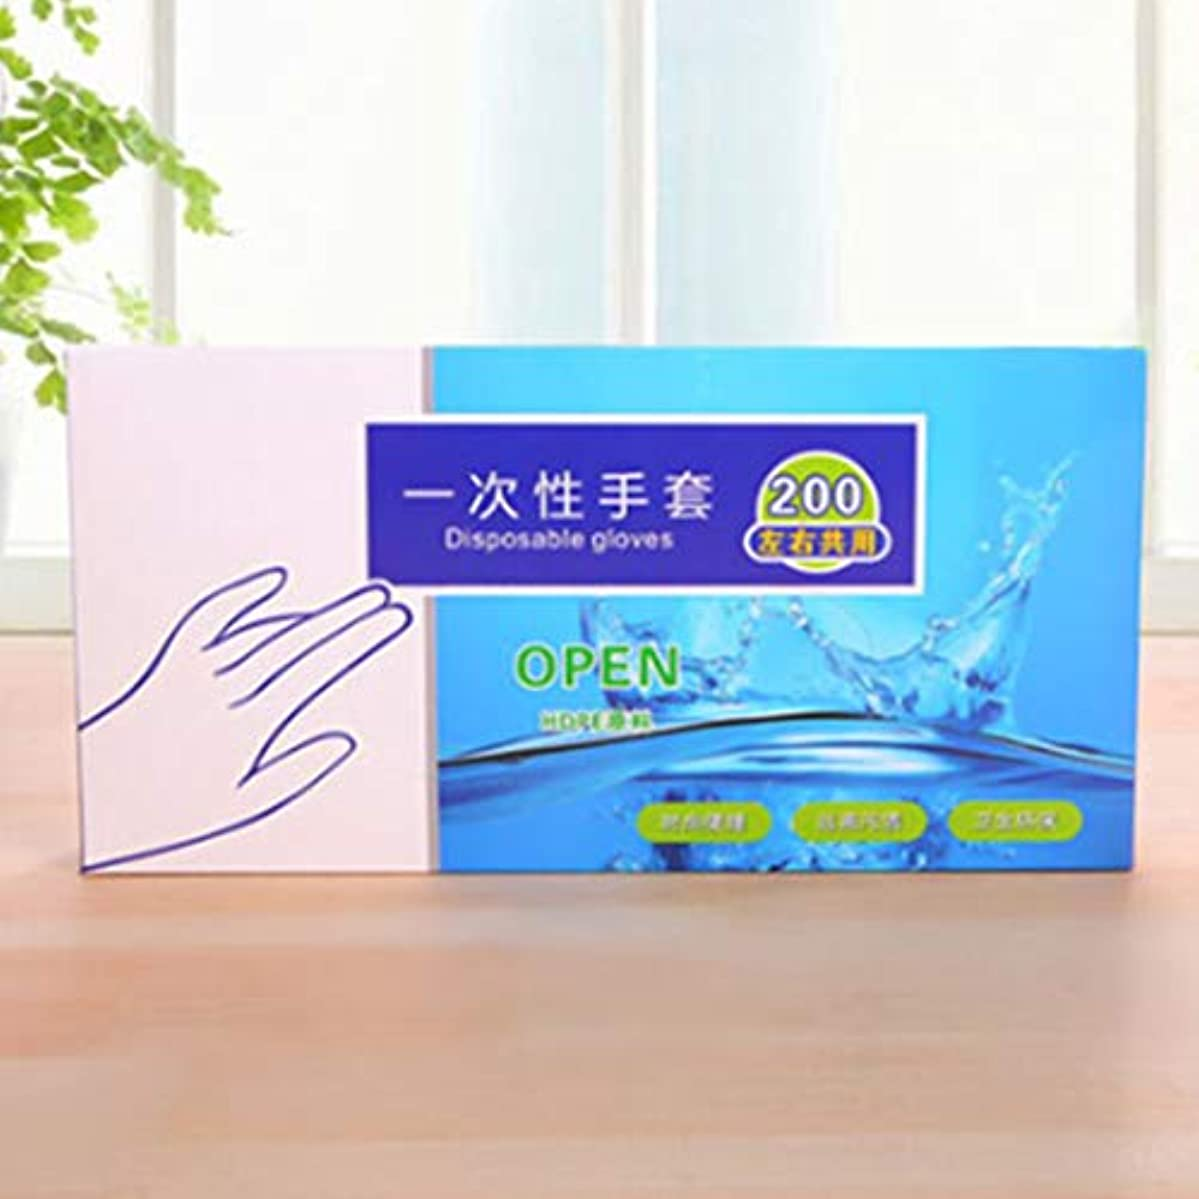 SODAOA屋 使い捨て手袋 透明 実用 衛生 プラスチック 調理 お掃除 毛染め 100枚/200枚 (200)